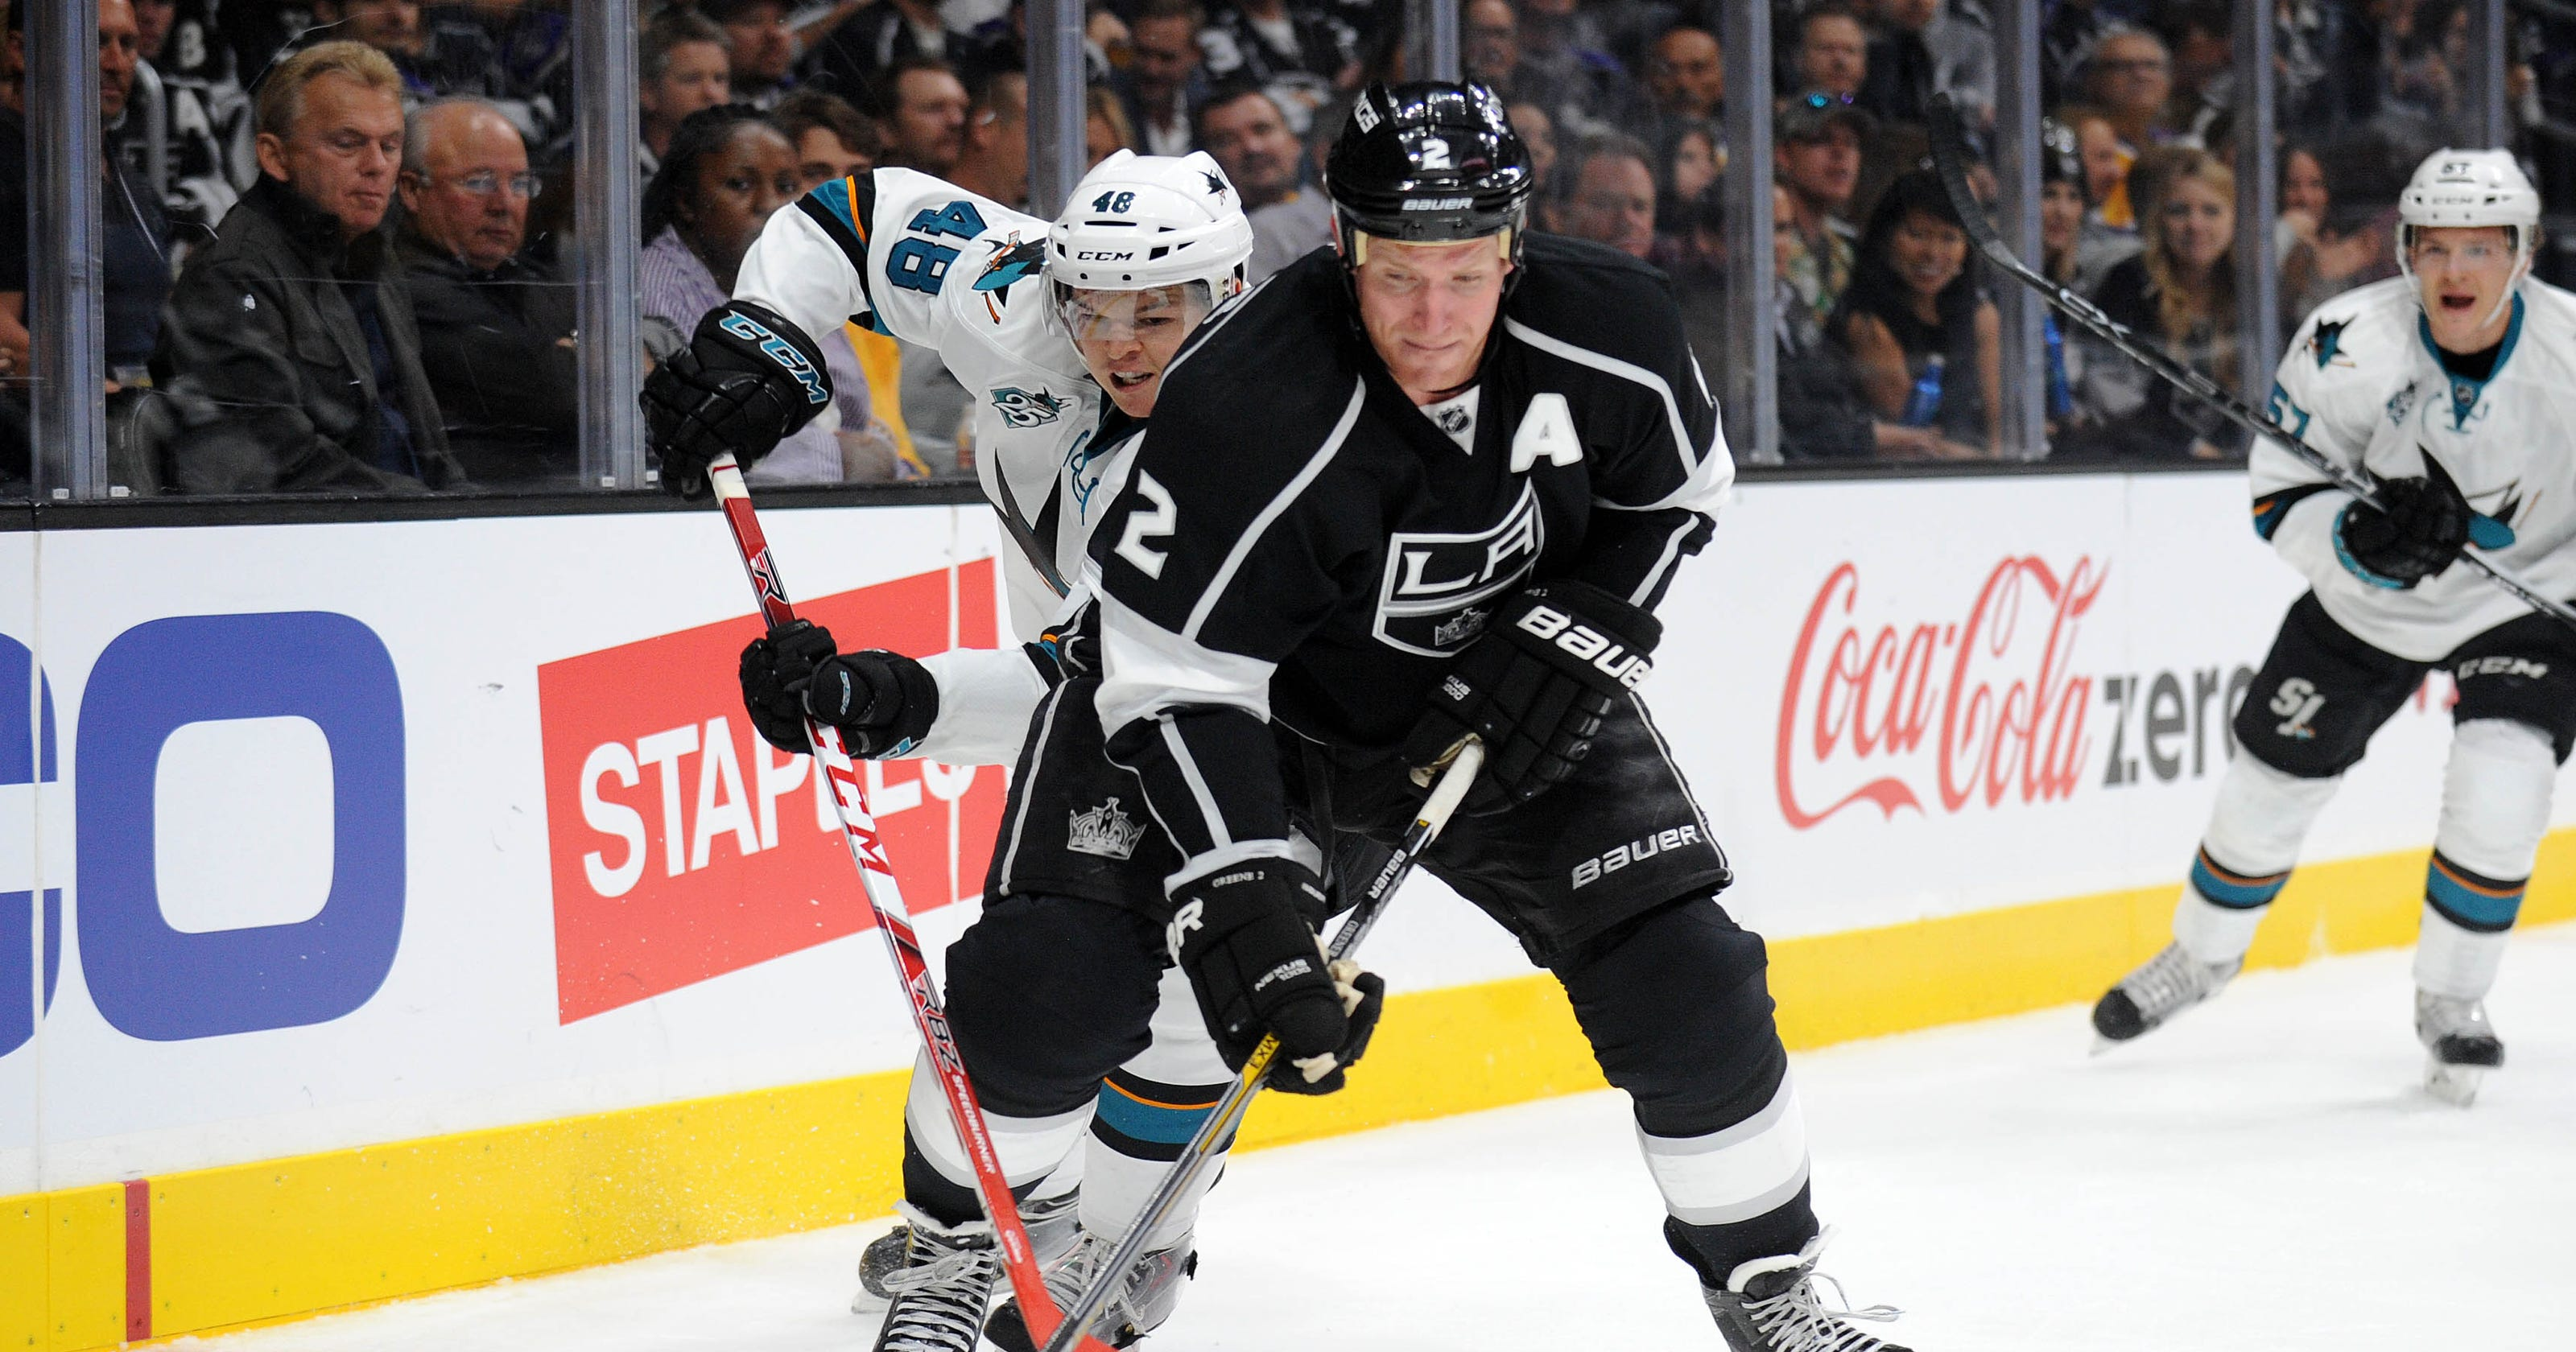 Stanley Cup champion Matt Greene had dream career in hockey